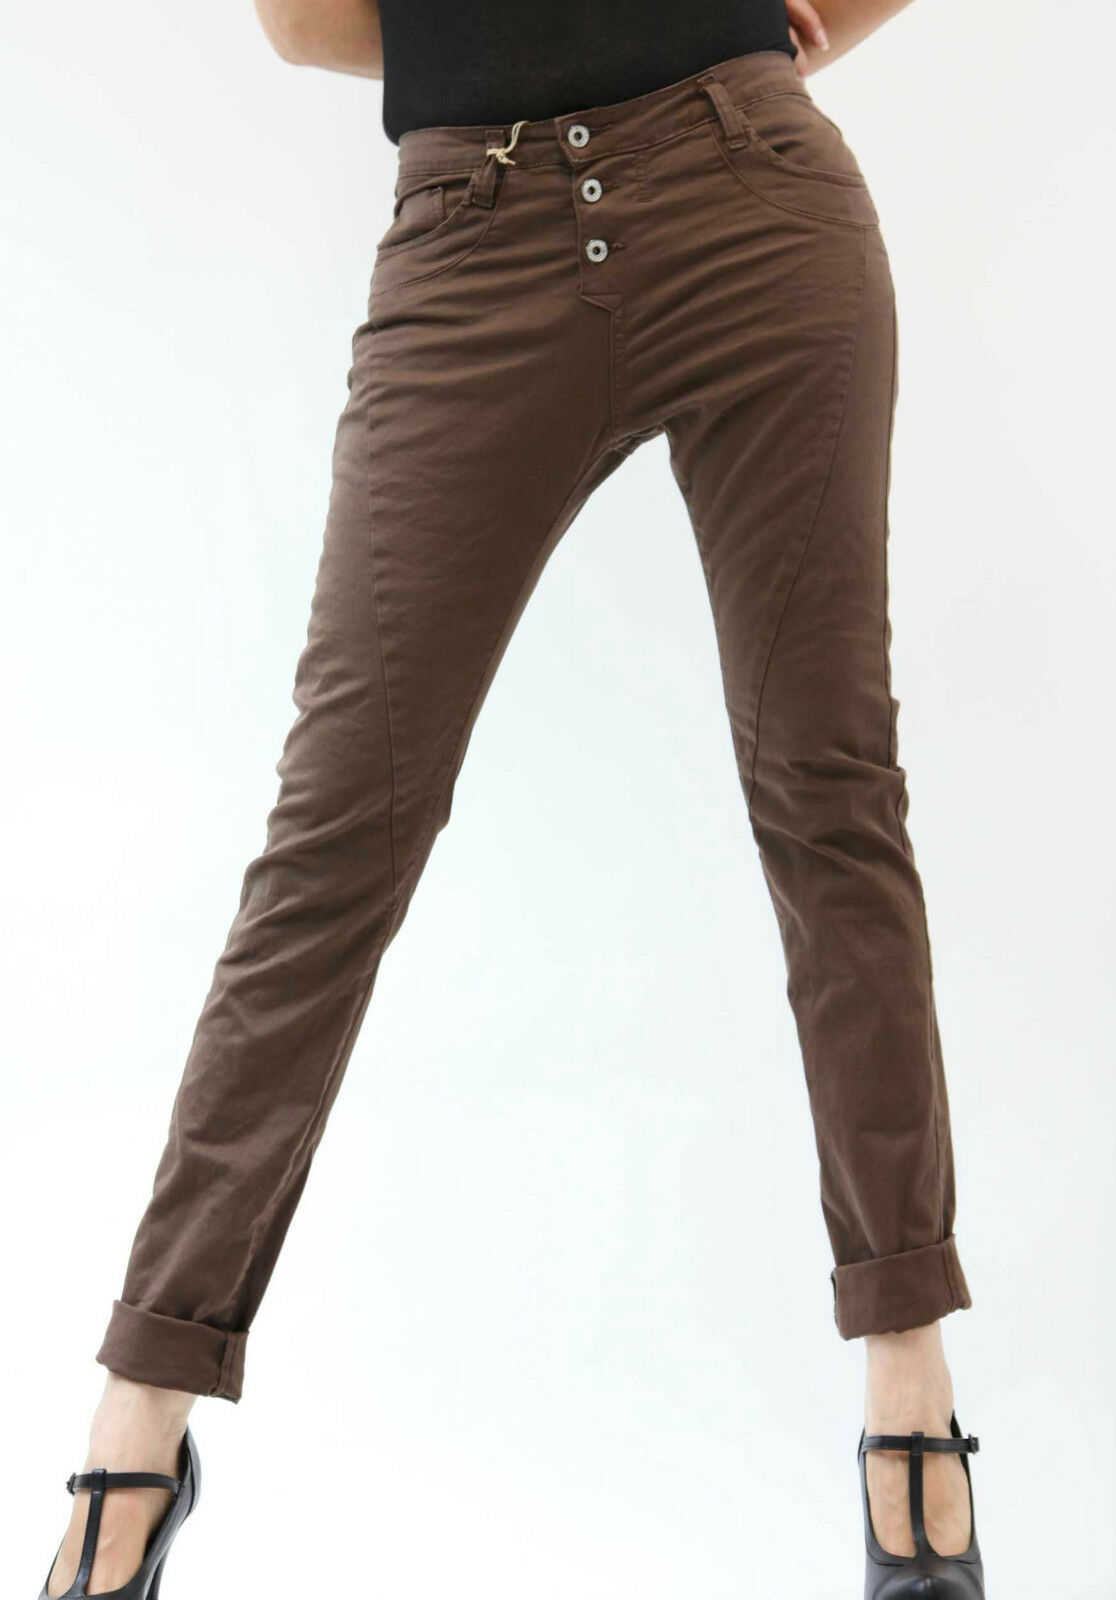 PLEASE Jeans Jeans Jeans P78ADT6TD boyfriend Donna Baggy Cavallo Lungo 3 Bottoni - Chocolate a2dbaf